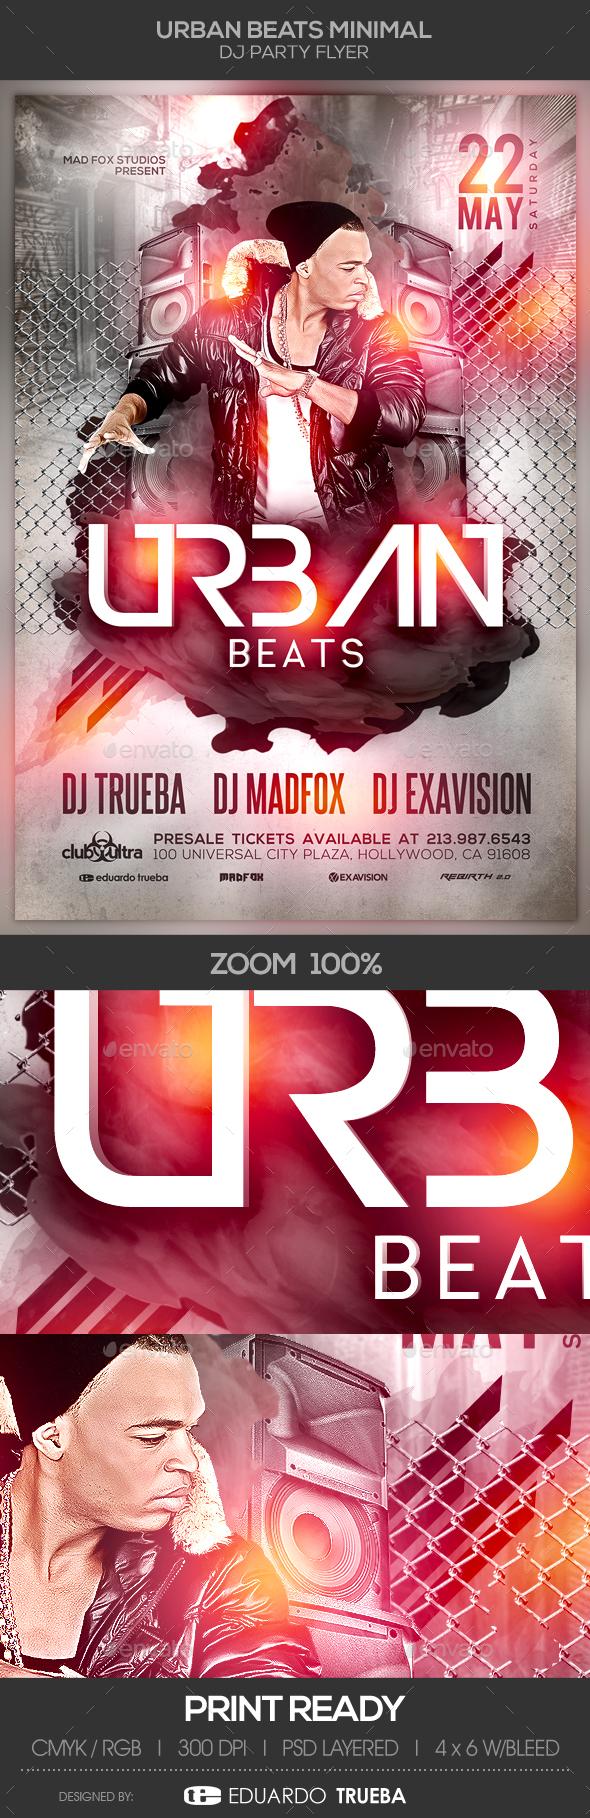 GraphicRiver Urban Beats Minimal Dj Party Flyer 21012309